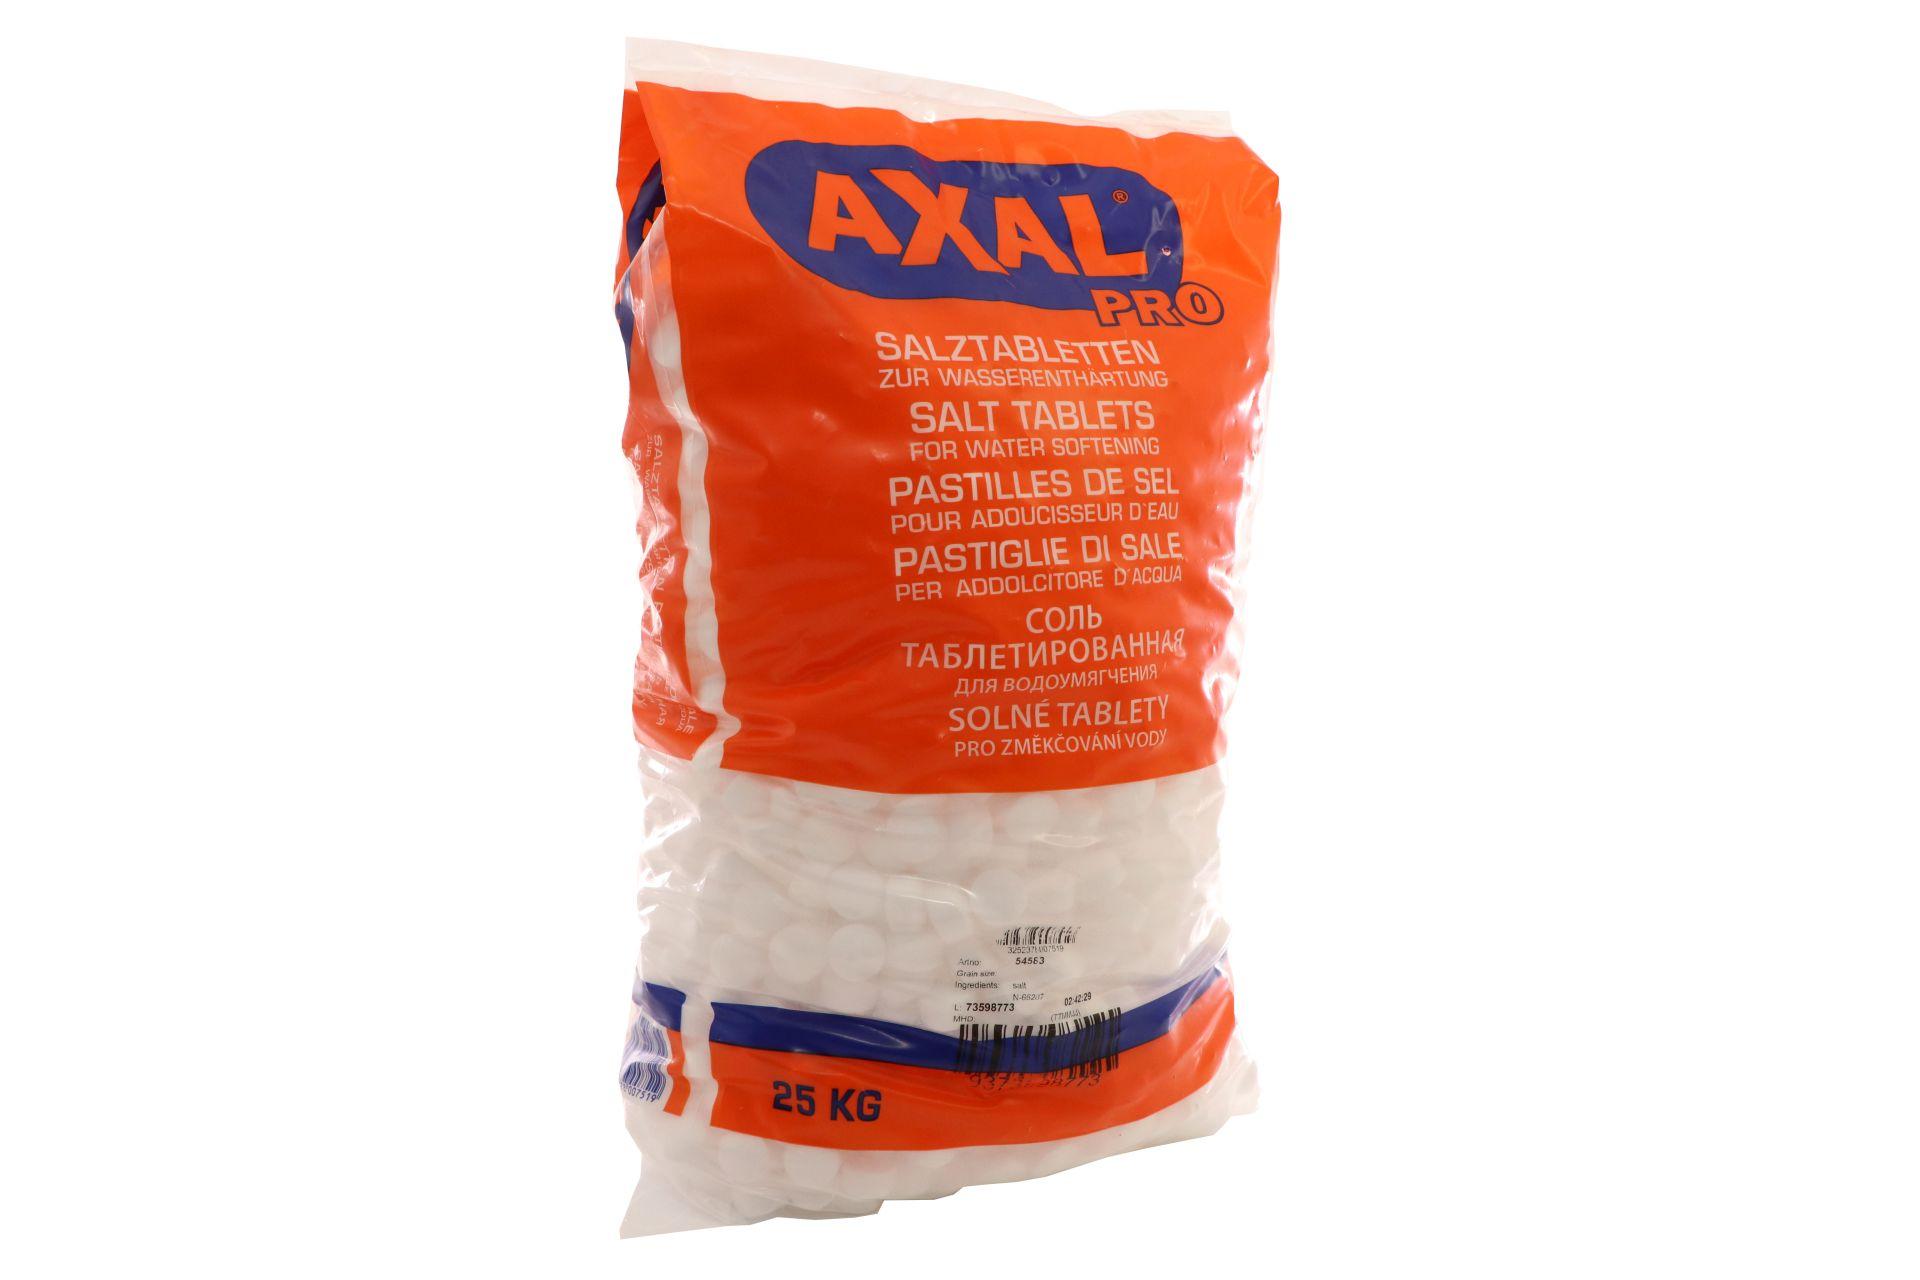 AXAL PRO Regeneriersalz, Tabletten zur Wasseraufbereitung, 25 kg